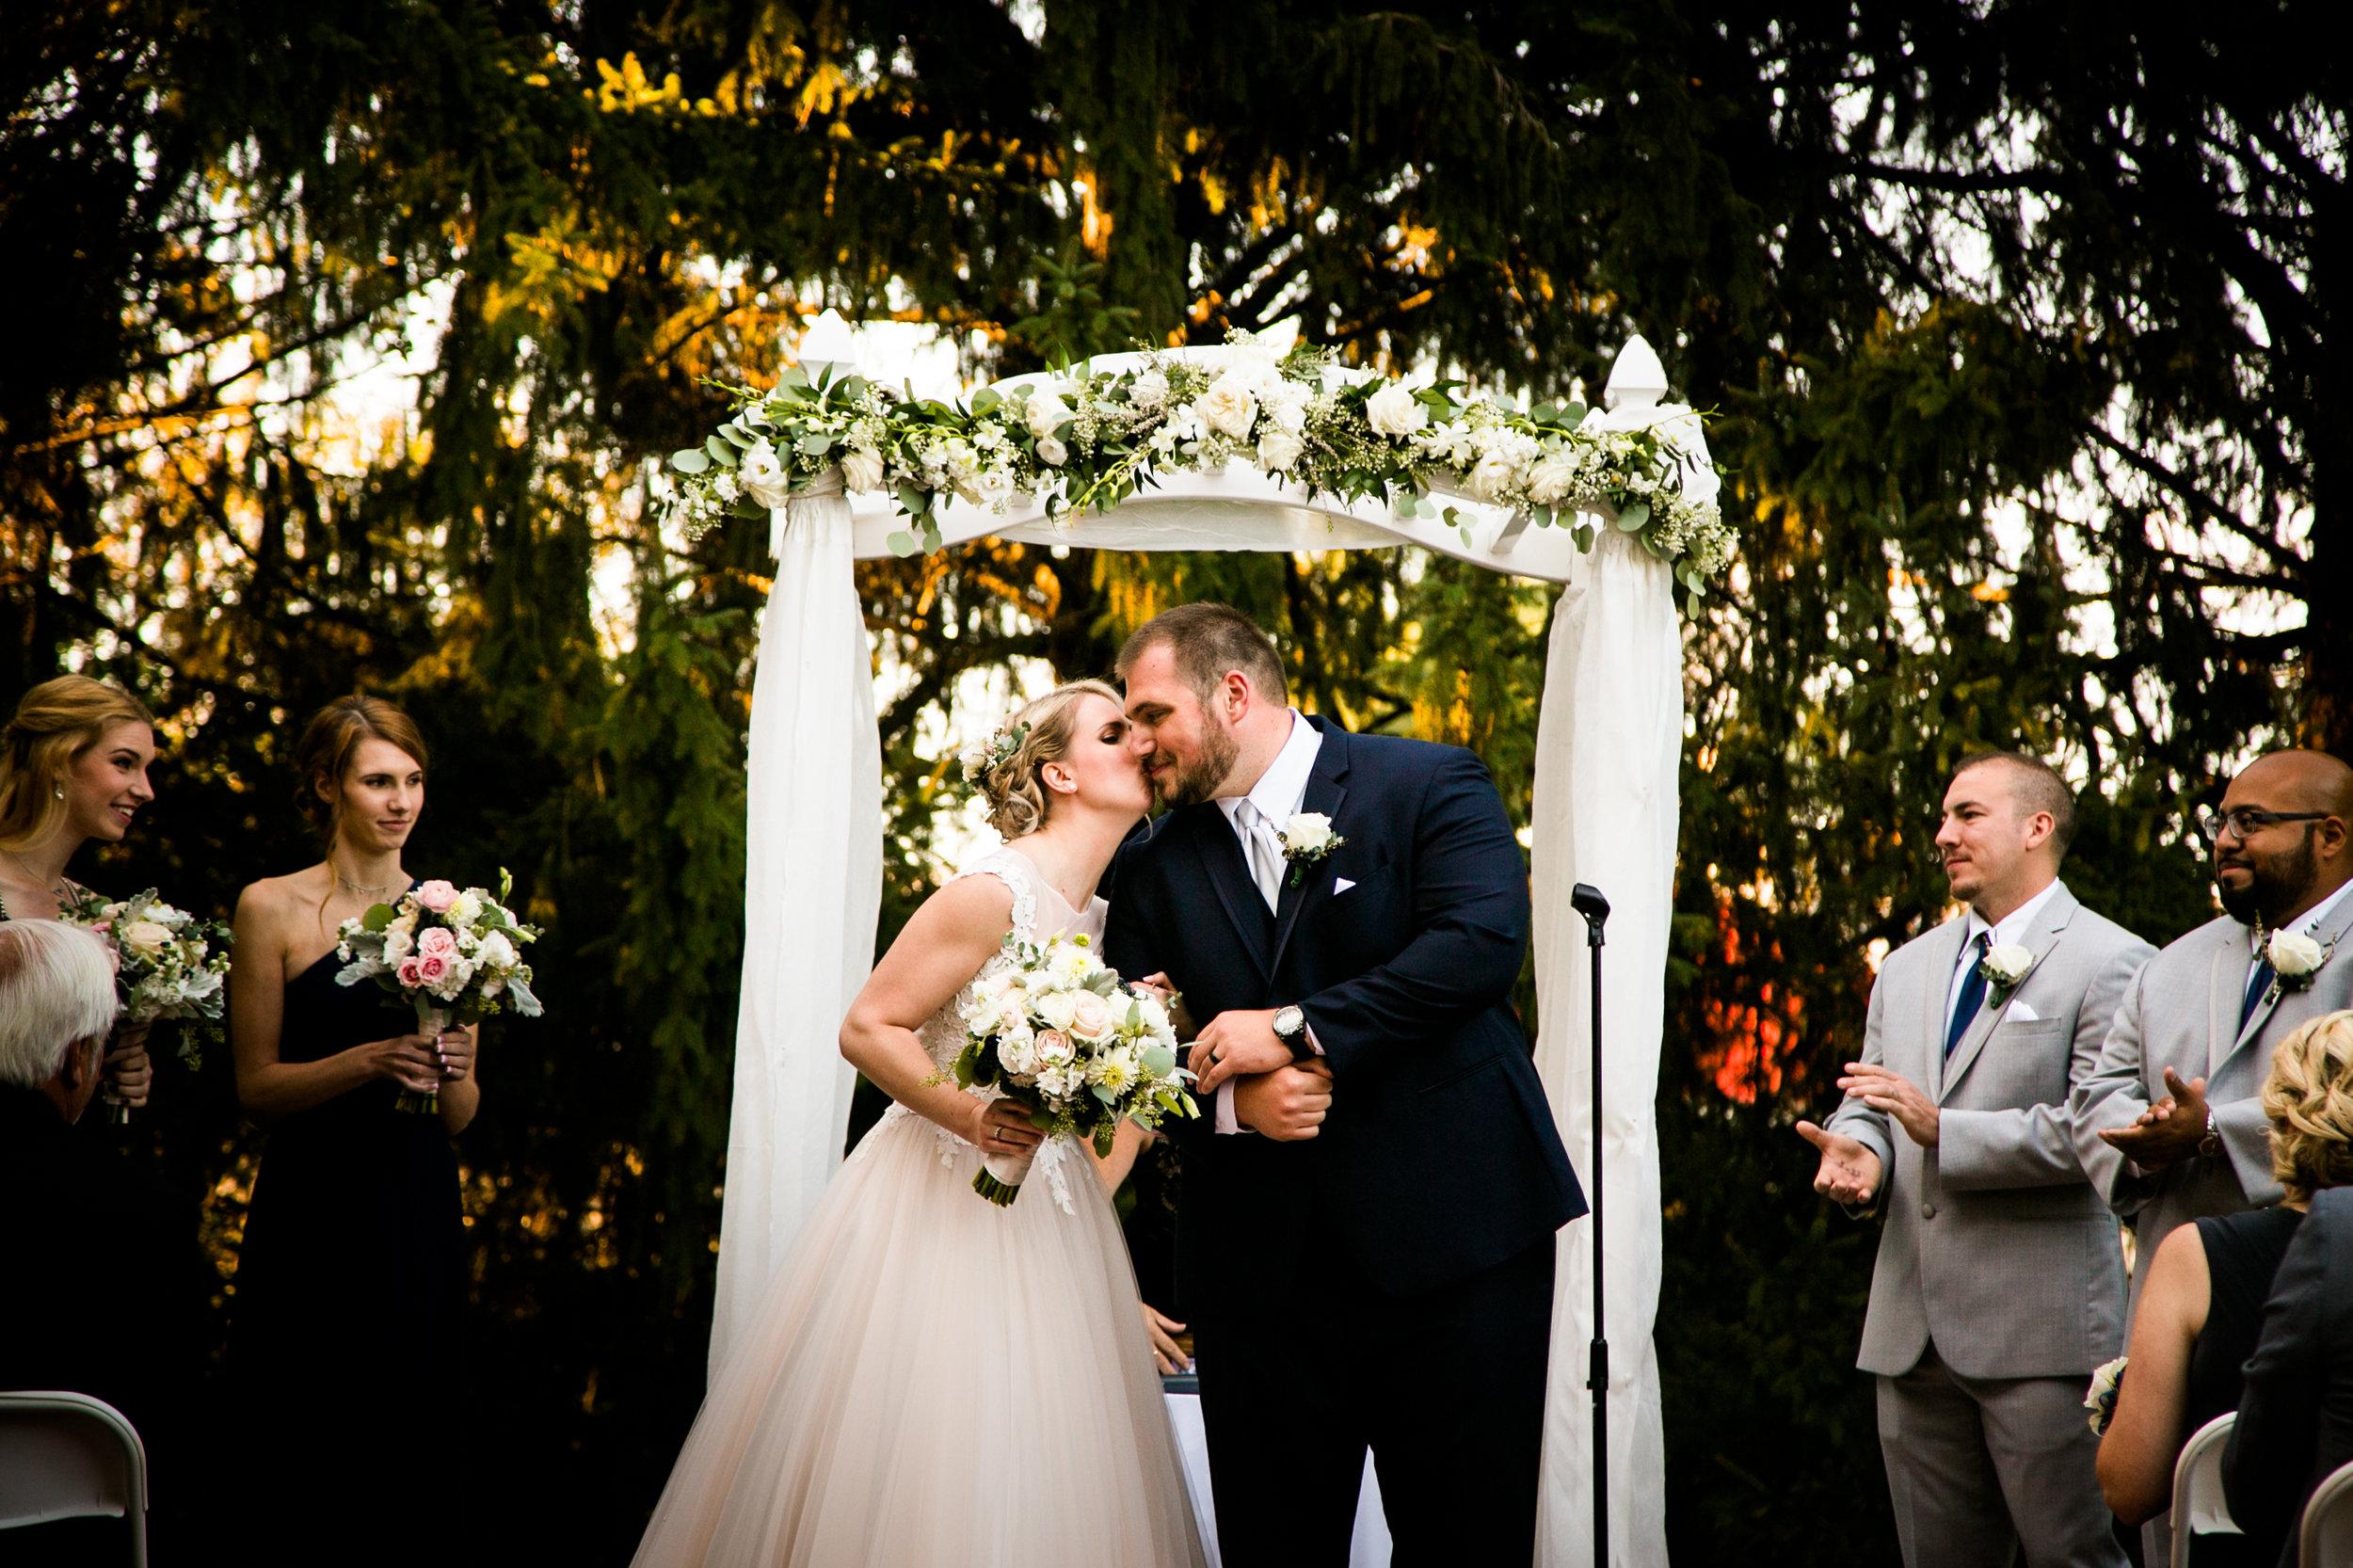 LA LUNA BANQUET HALL WEDDING BENSALEM - 055.jpg